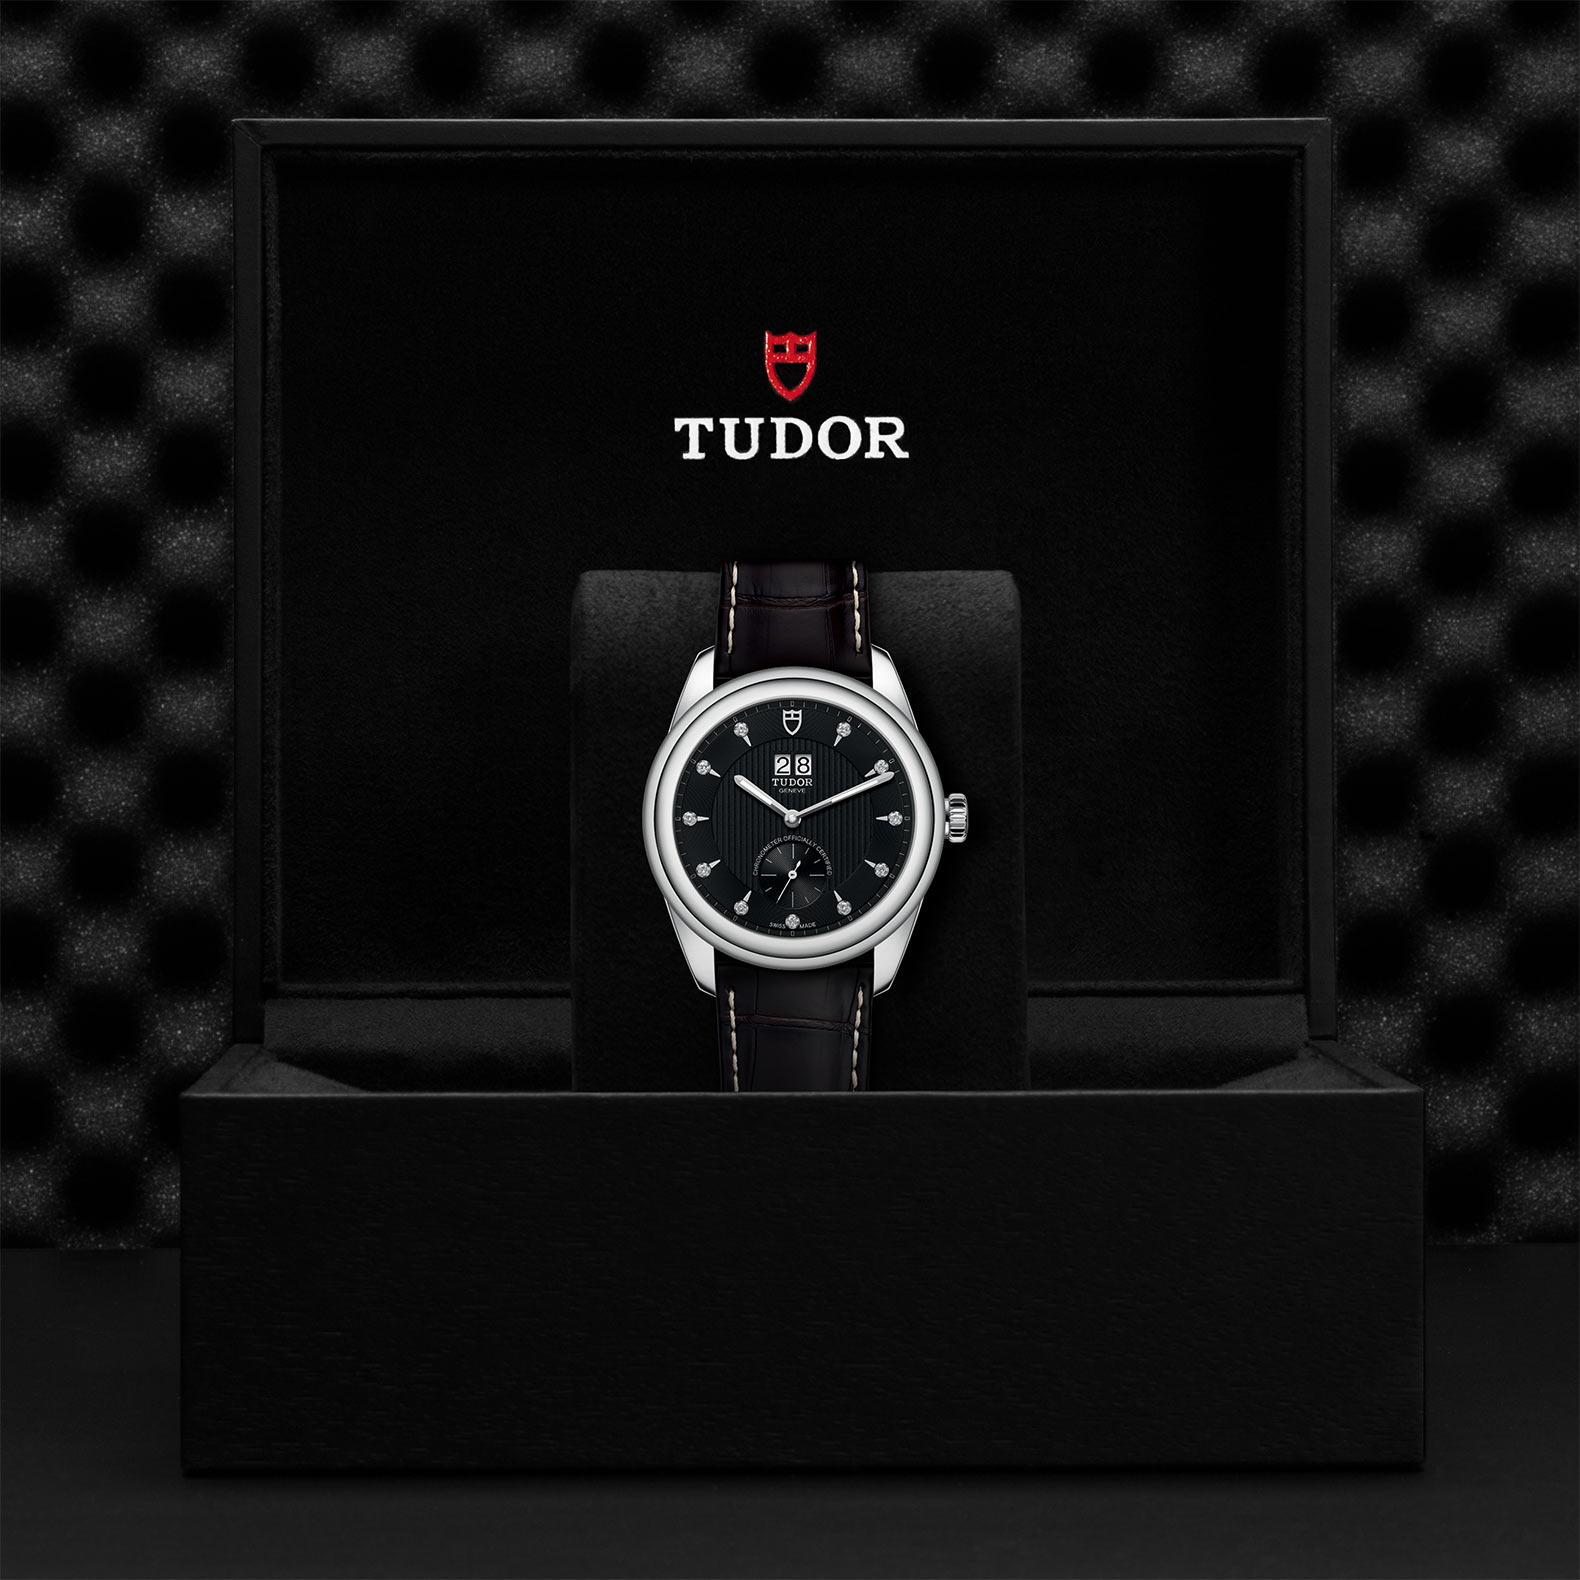 TUDOR Glamour Double Date M57100 0019 Presentationbox